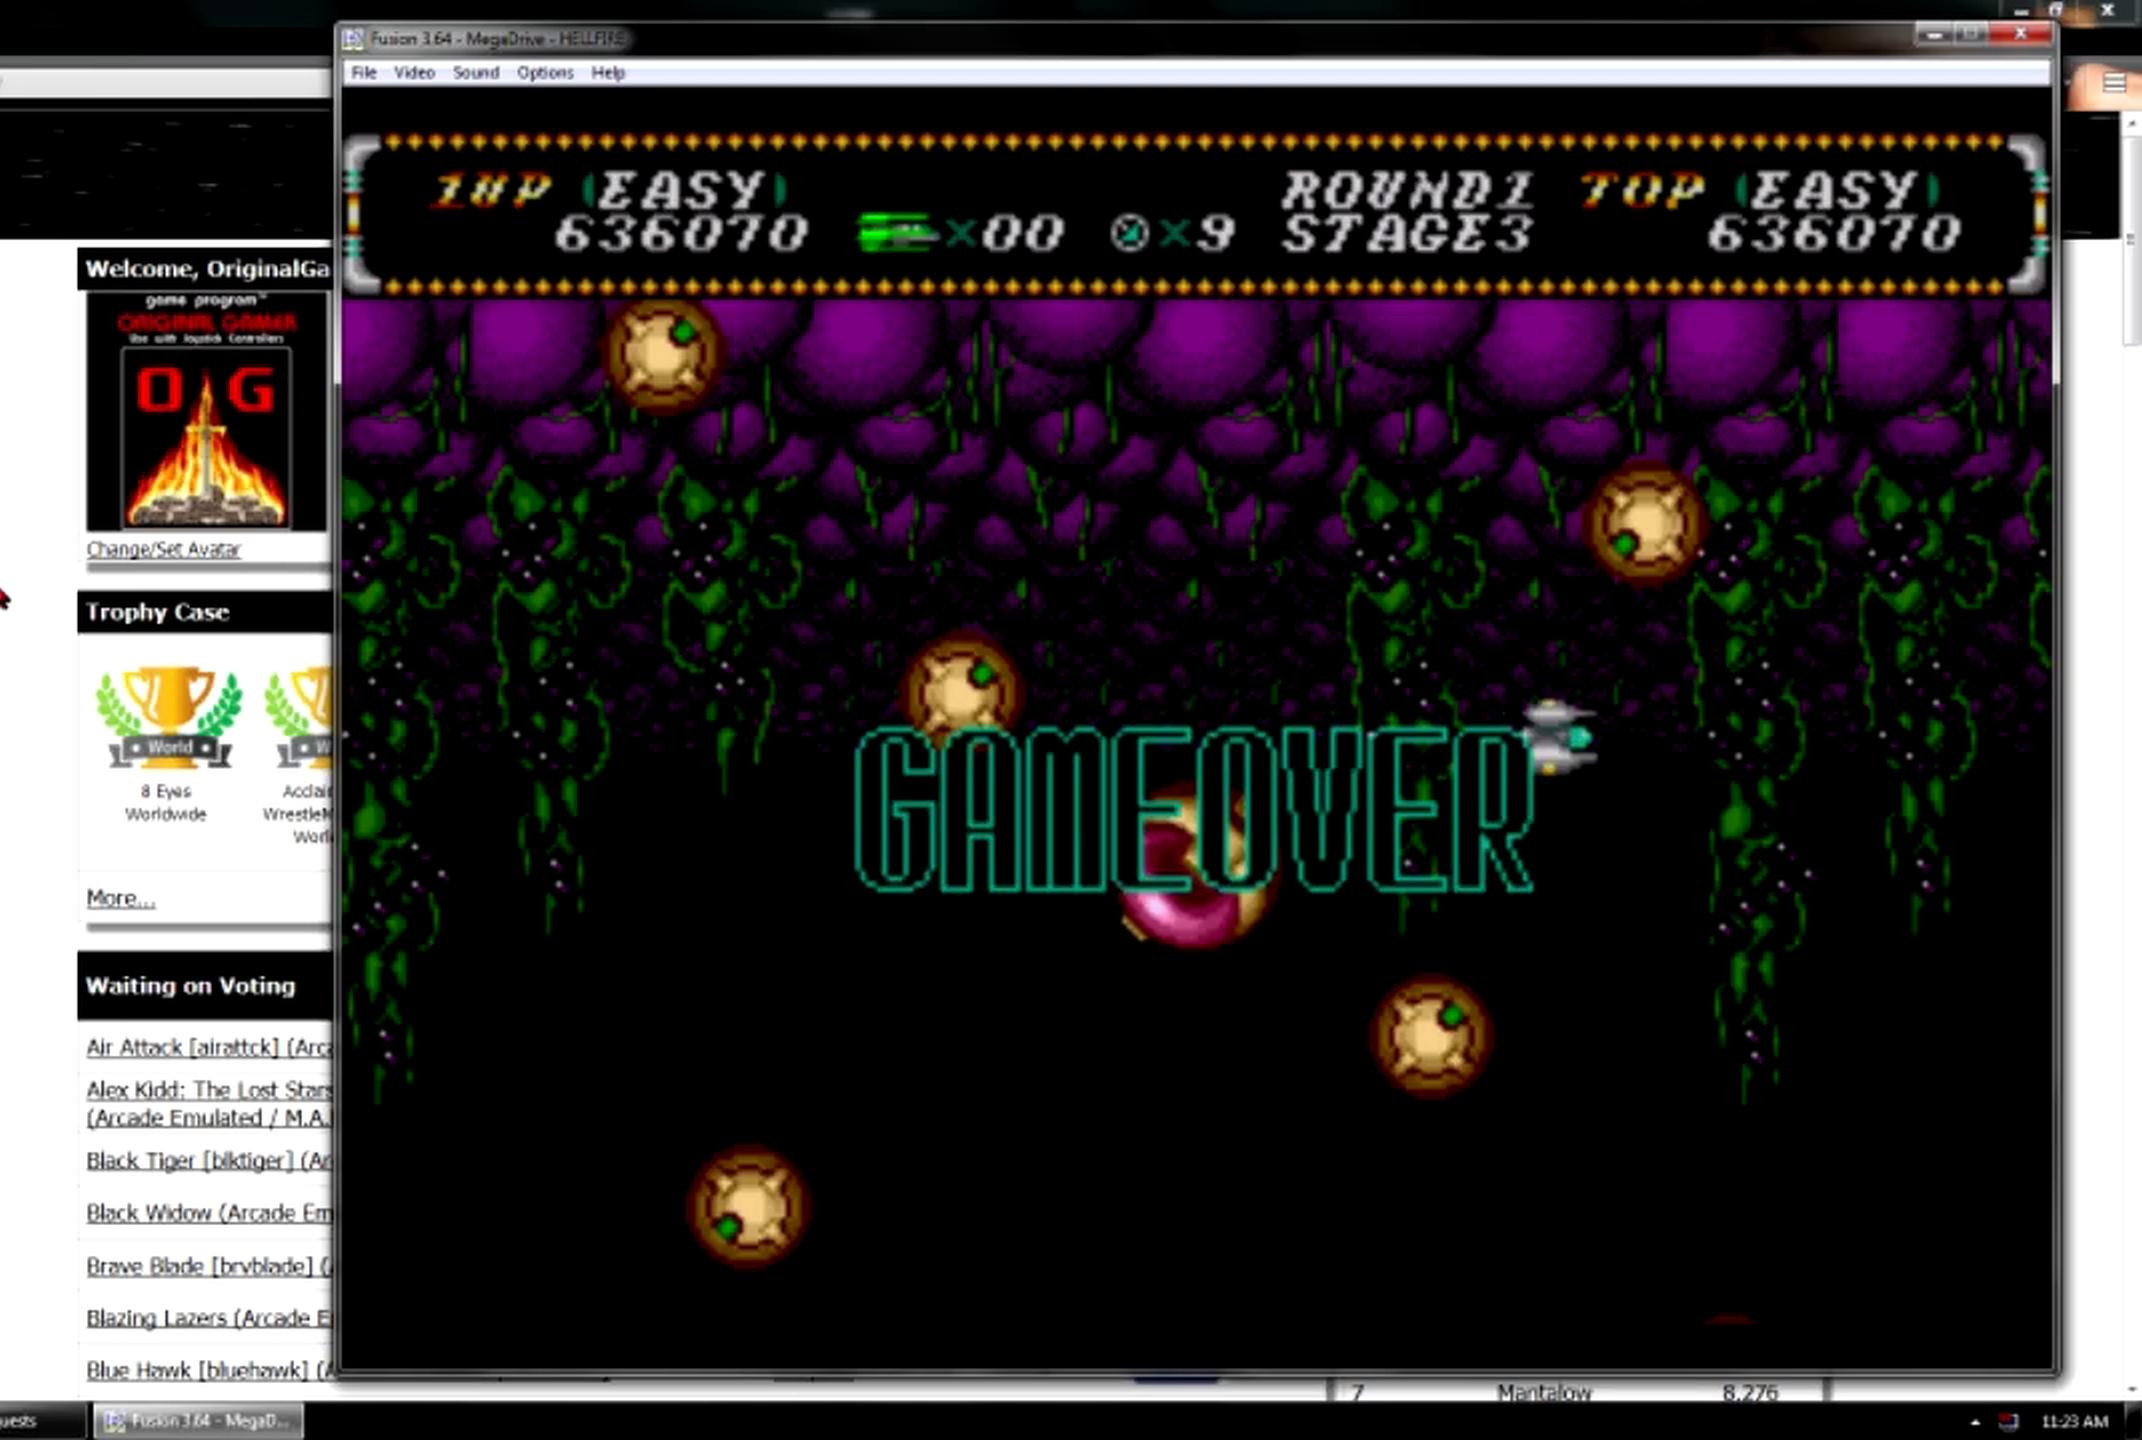 OriginalGamer: Hellfire: Easy (Sega Genesis / MegaDrive Emulated) 636,070 points on 2015-06-08 23:56:41